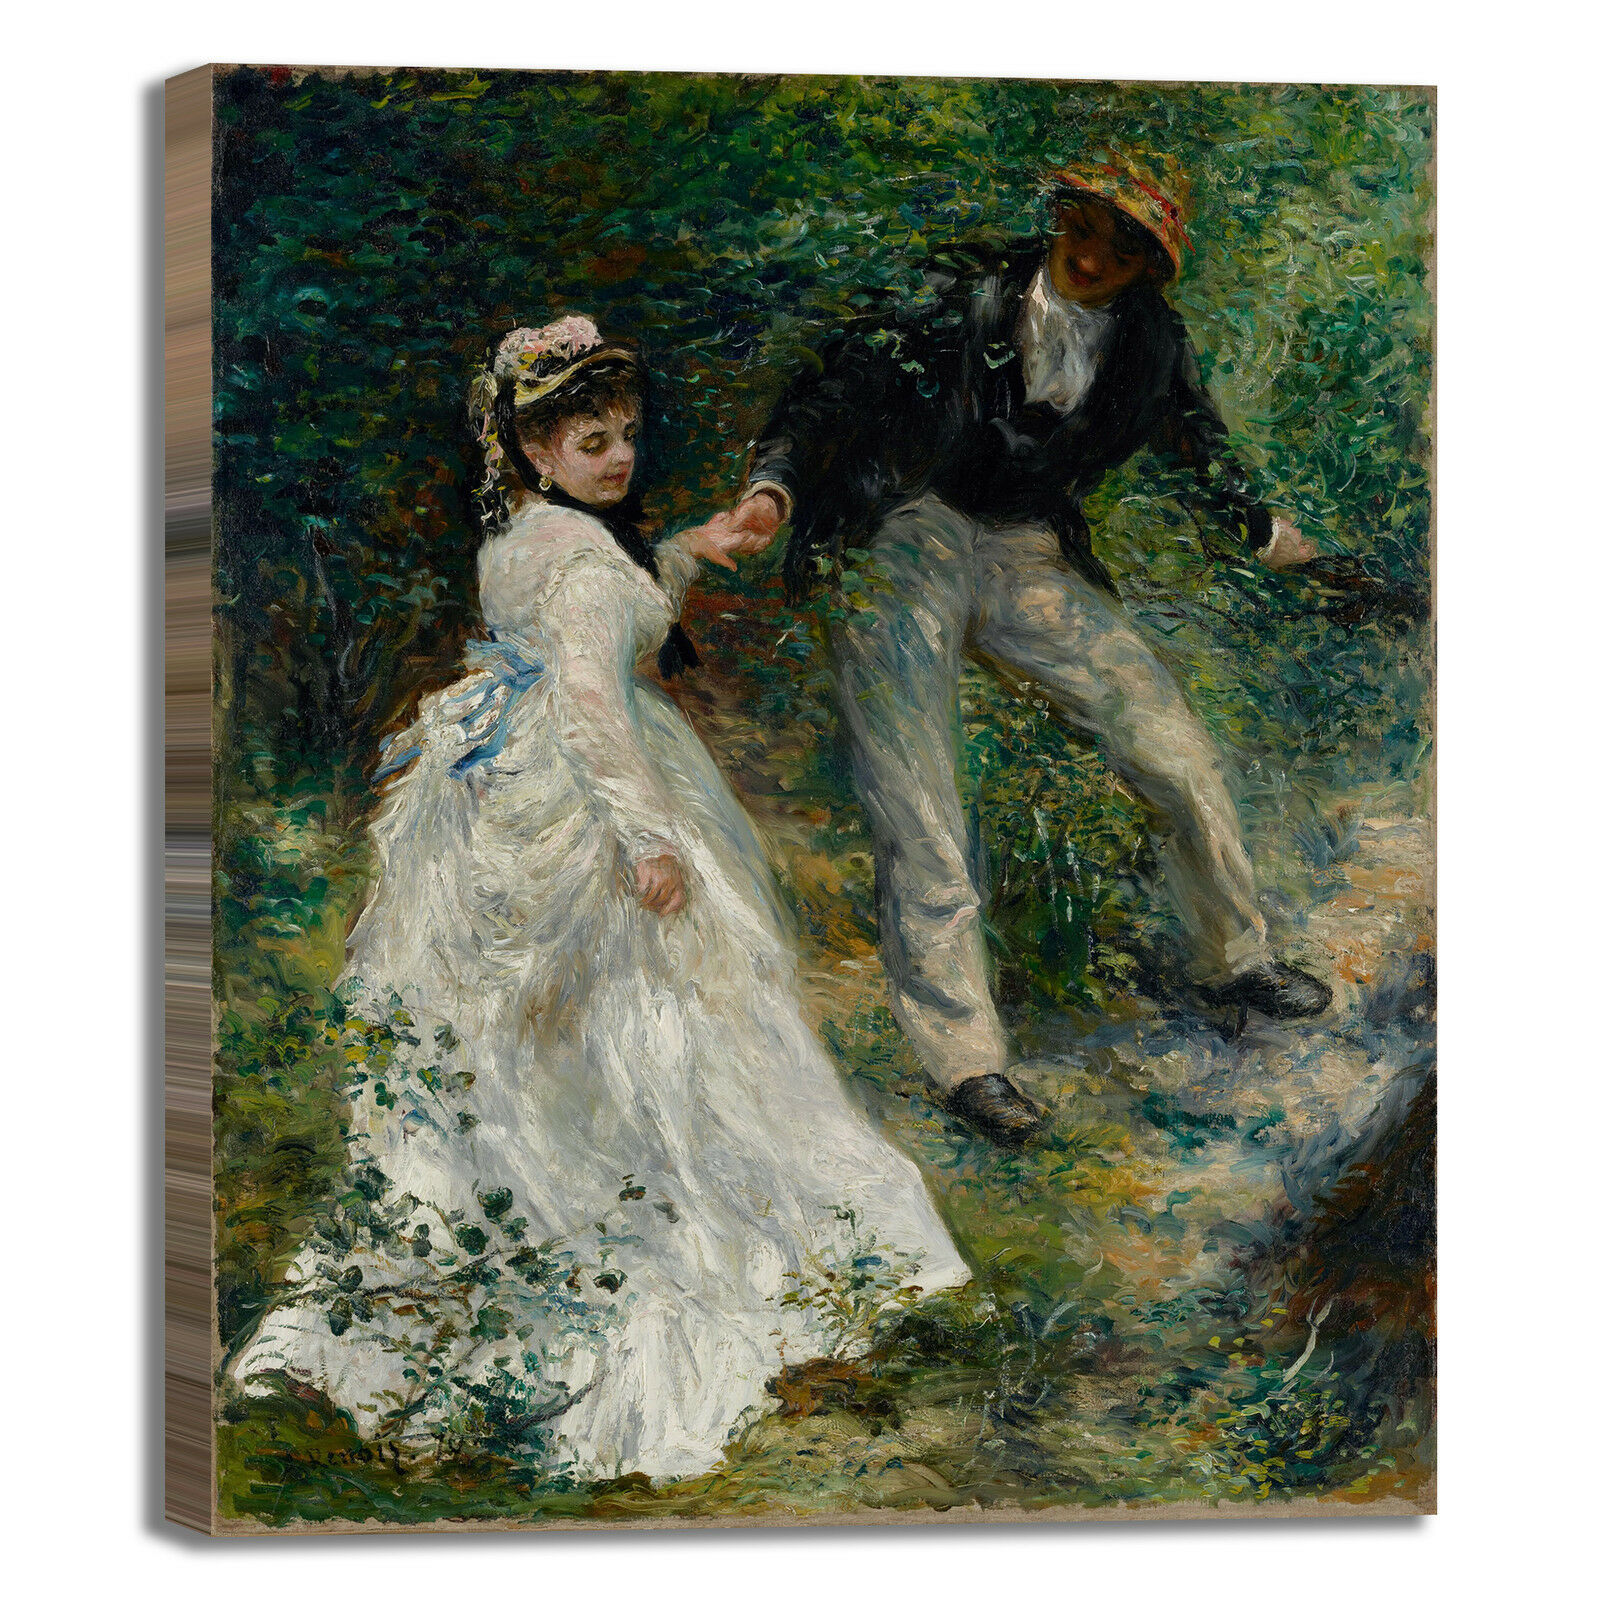 Renoir la passeggiata design quadro stampa tela o dipinto telaio arRouge o tela casa 691814